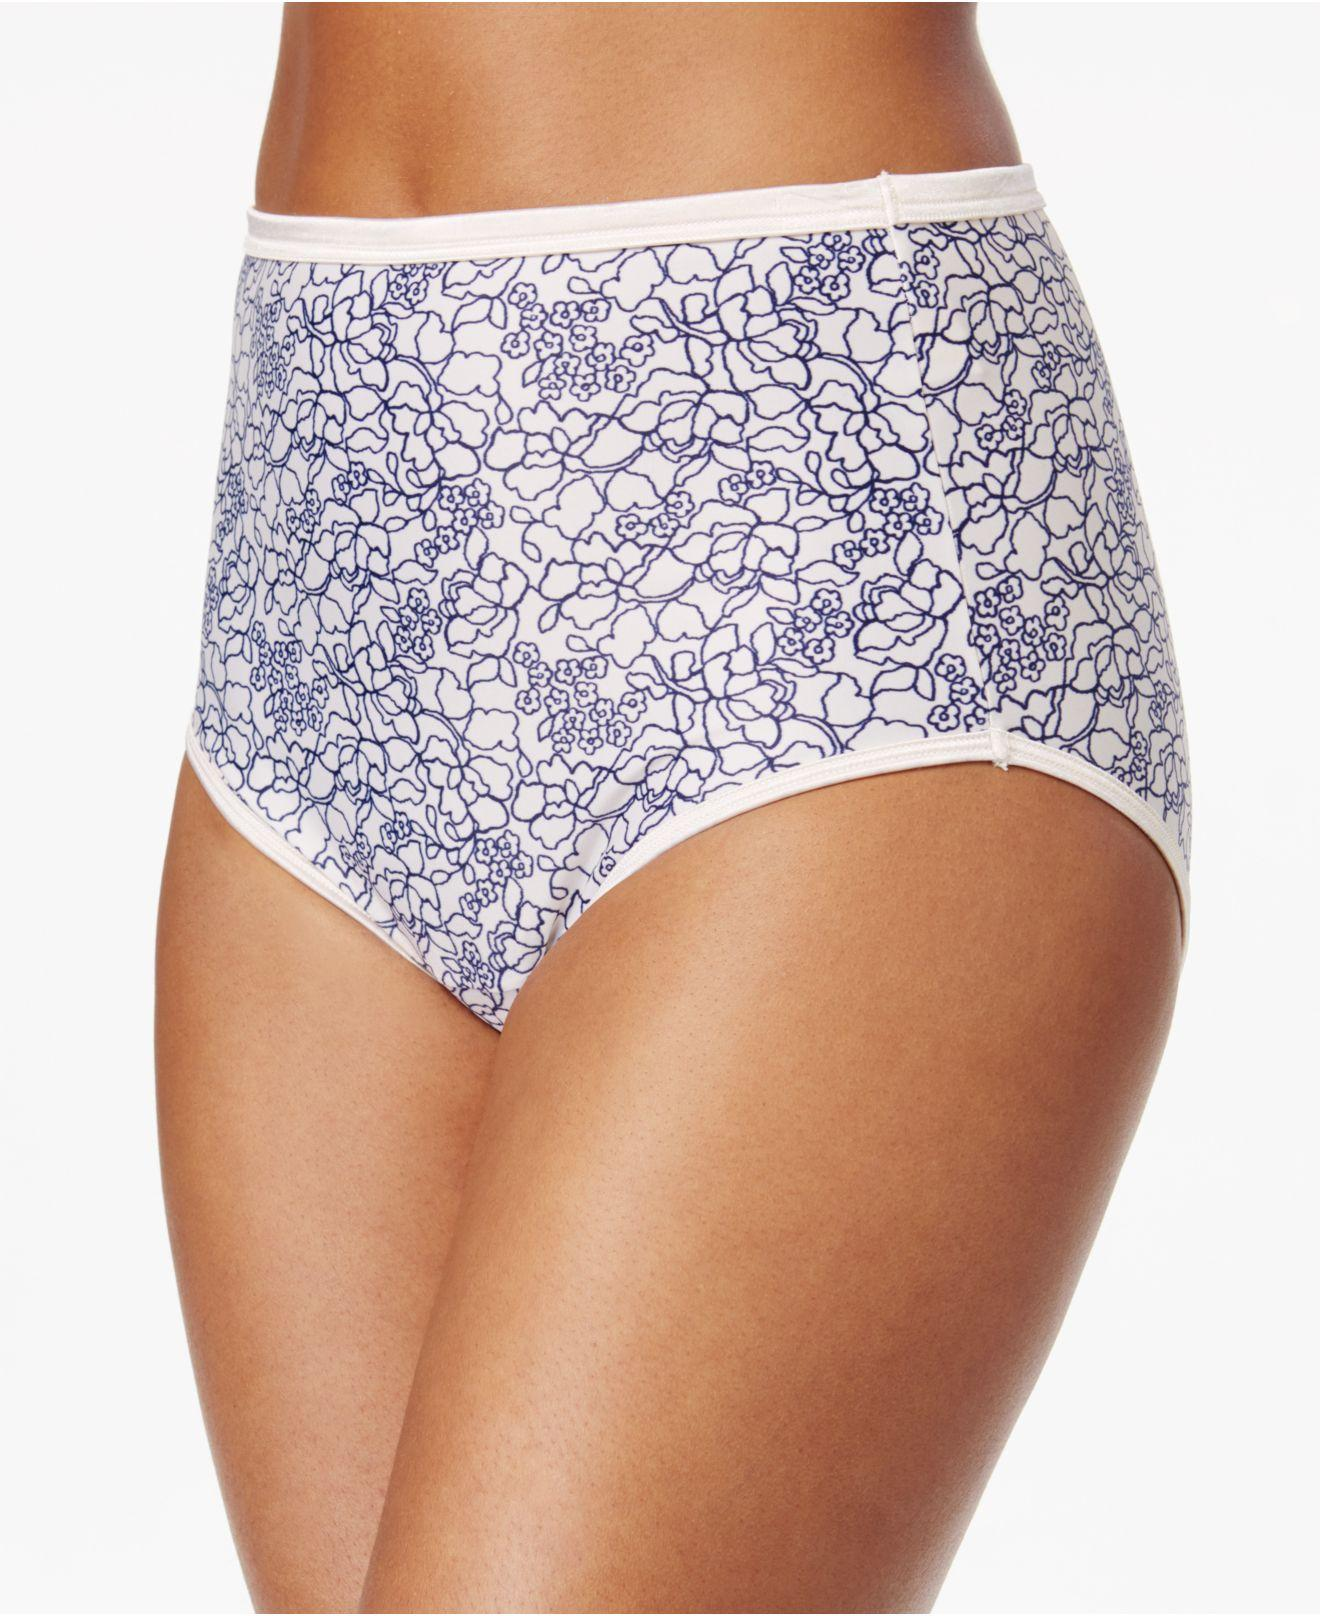 0dd1f6958f3f Vanity Fair. Women's Purple Plus Size Body Shine Illumination Brief 13109